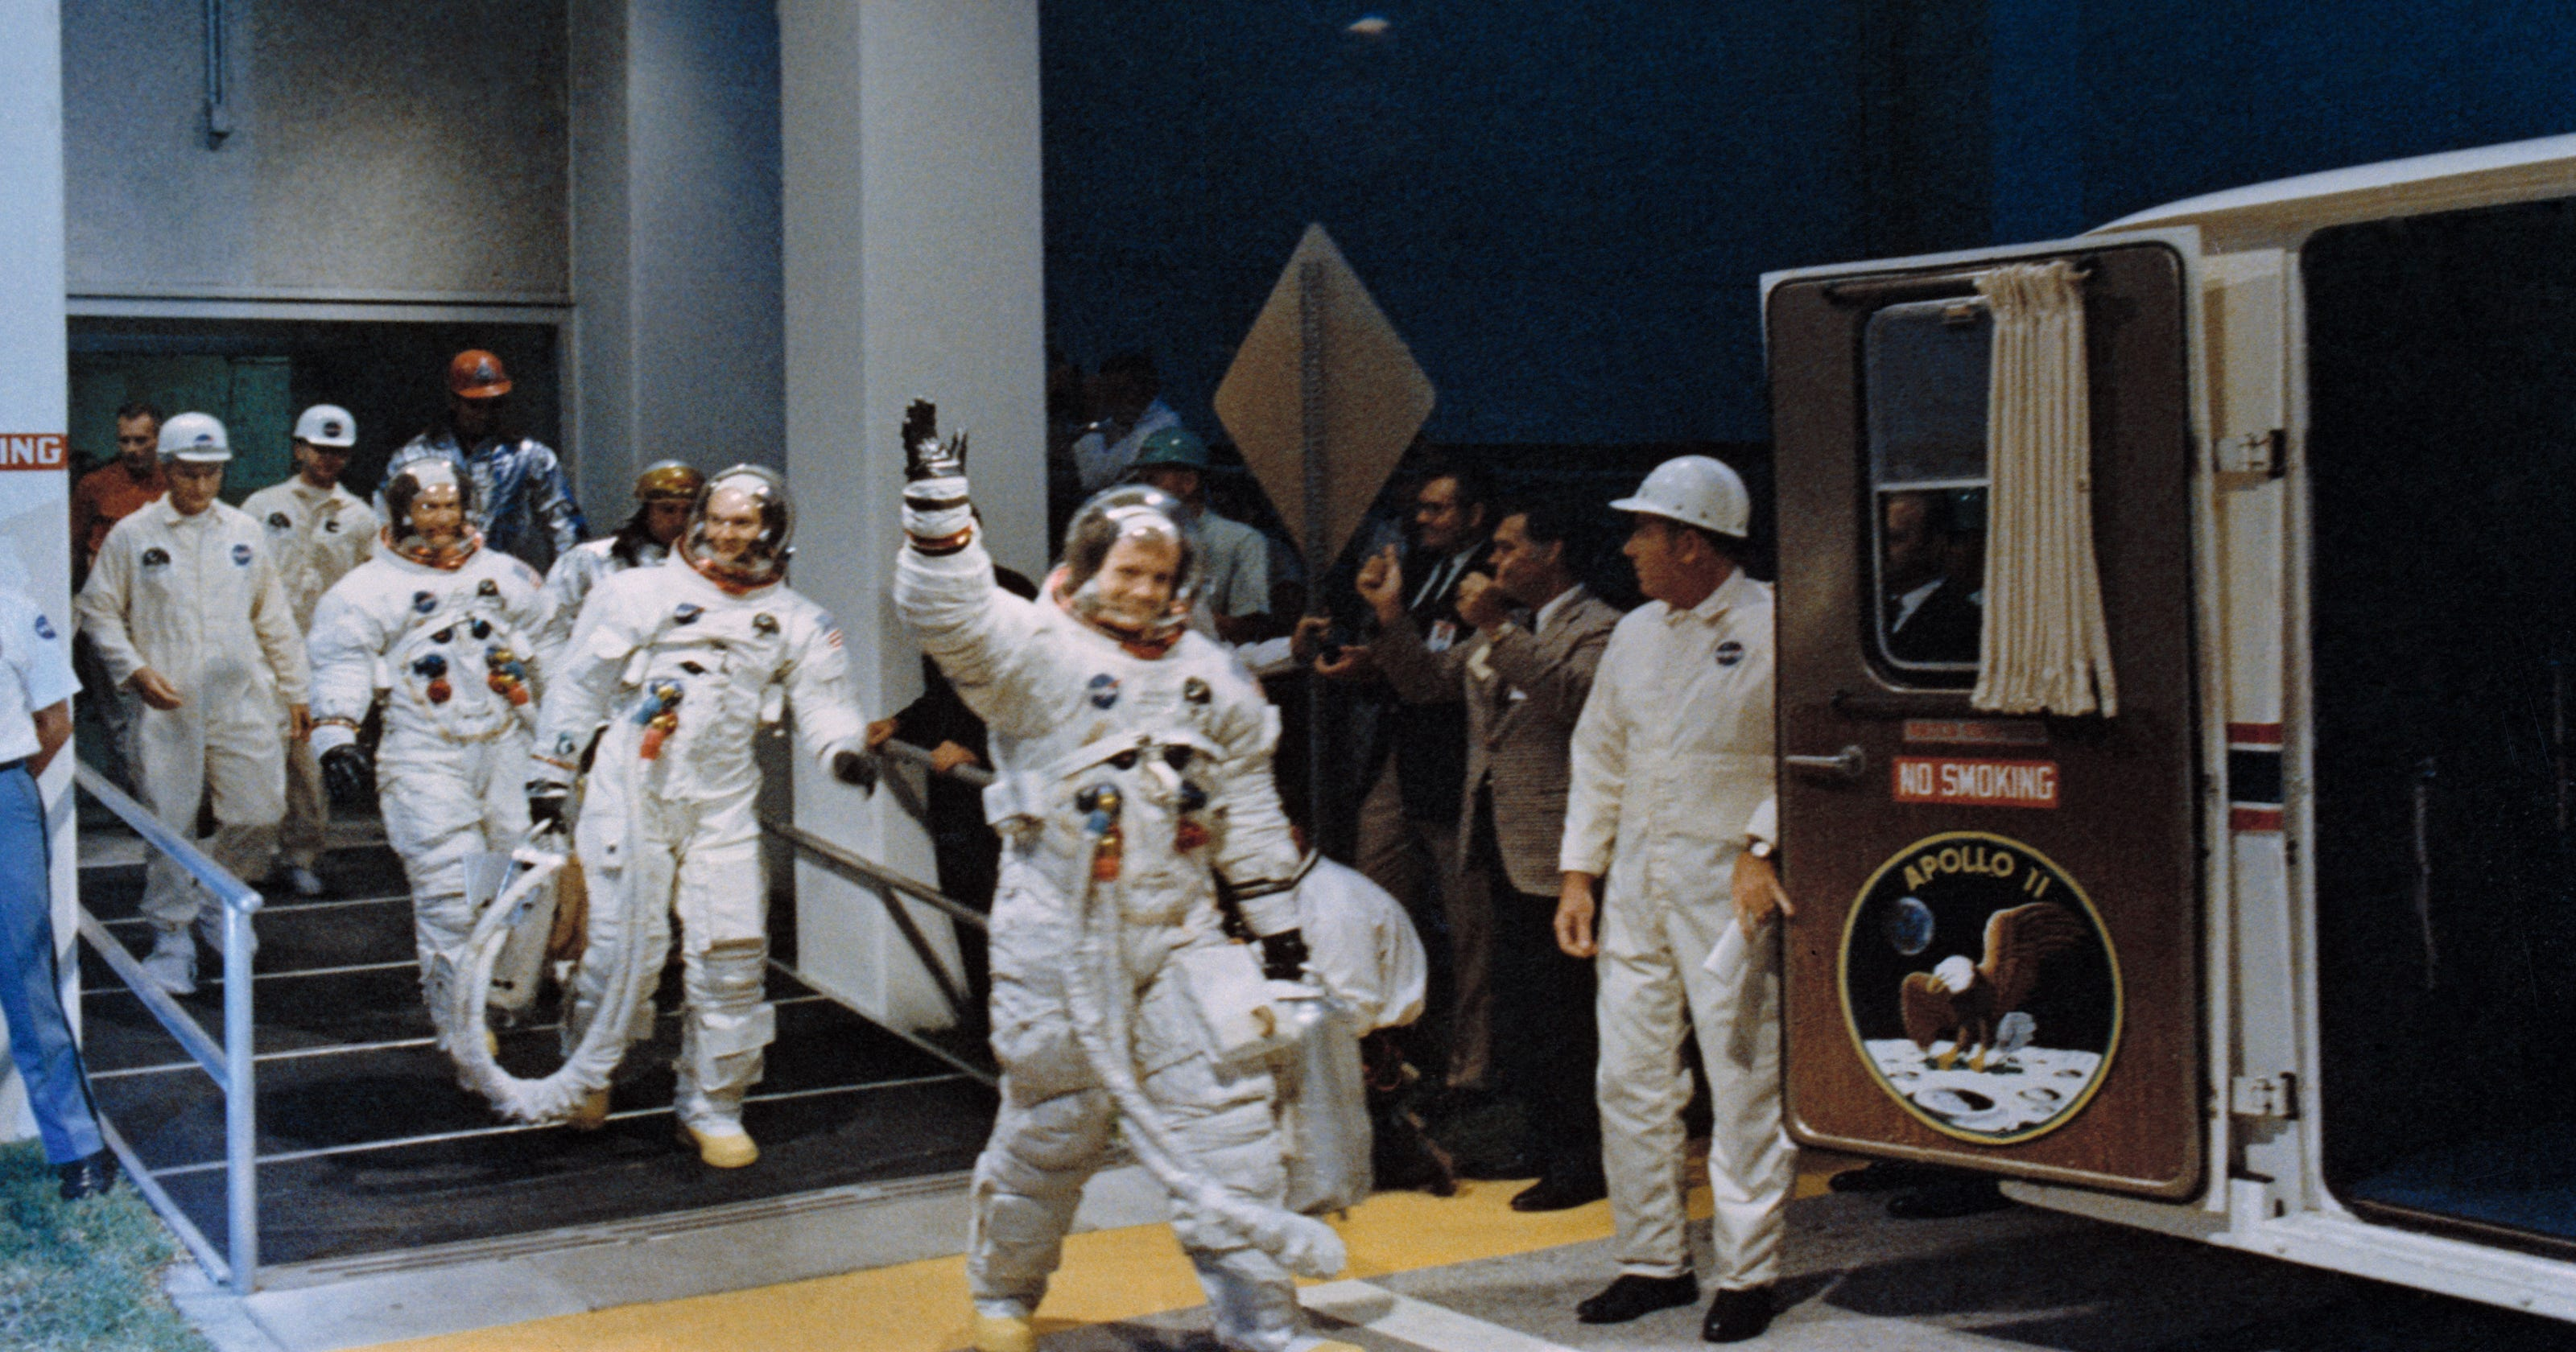 Nova' airs comprehensive Neil Armstrong profile on